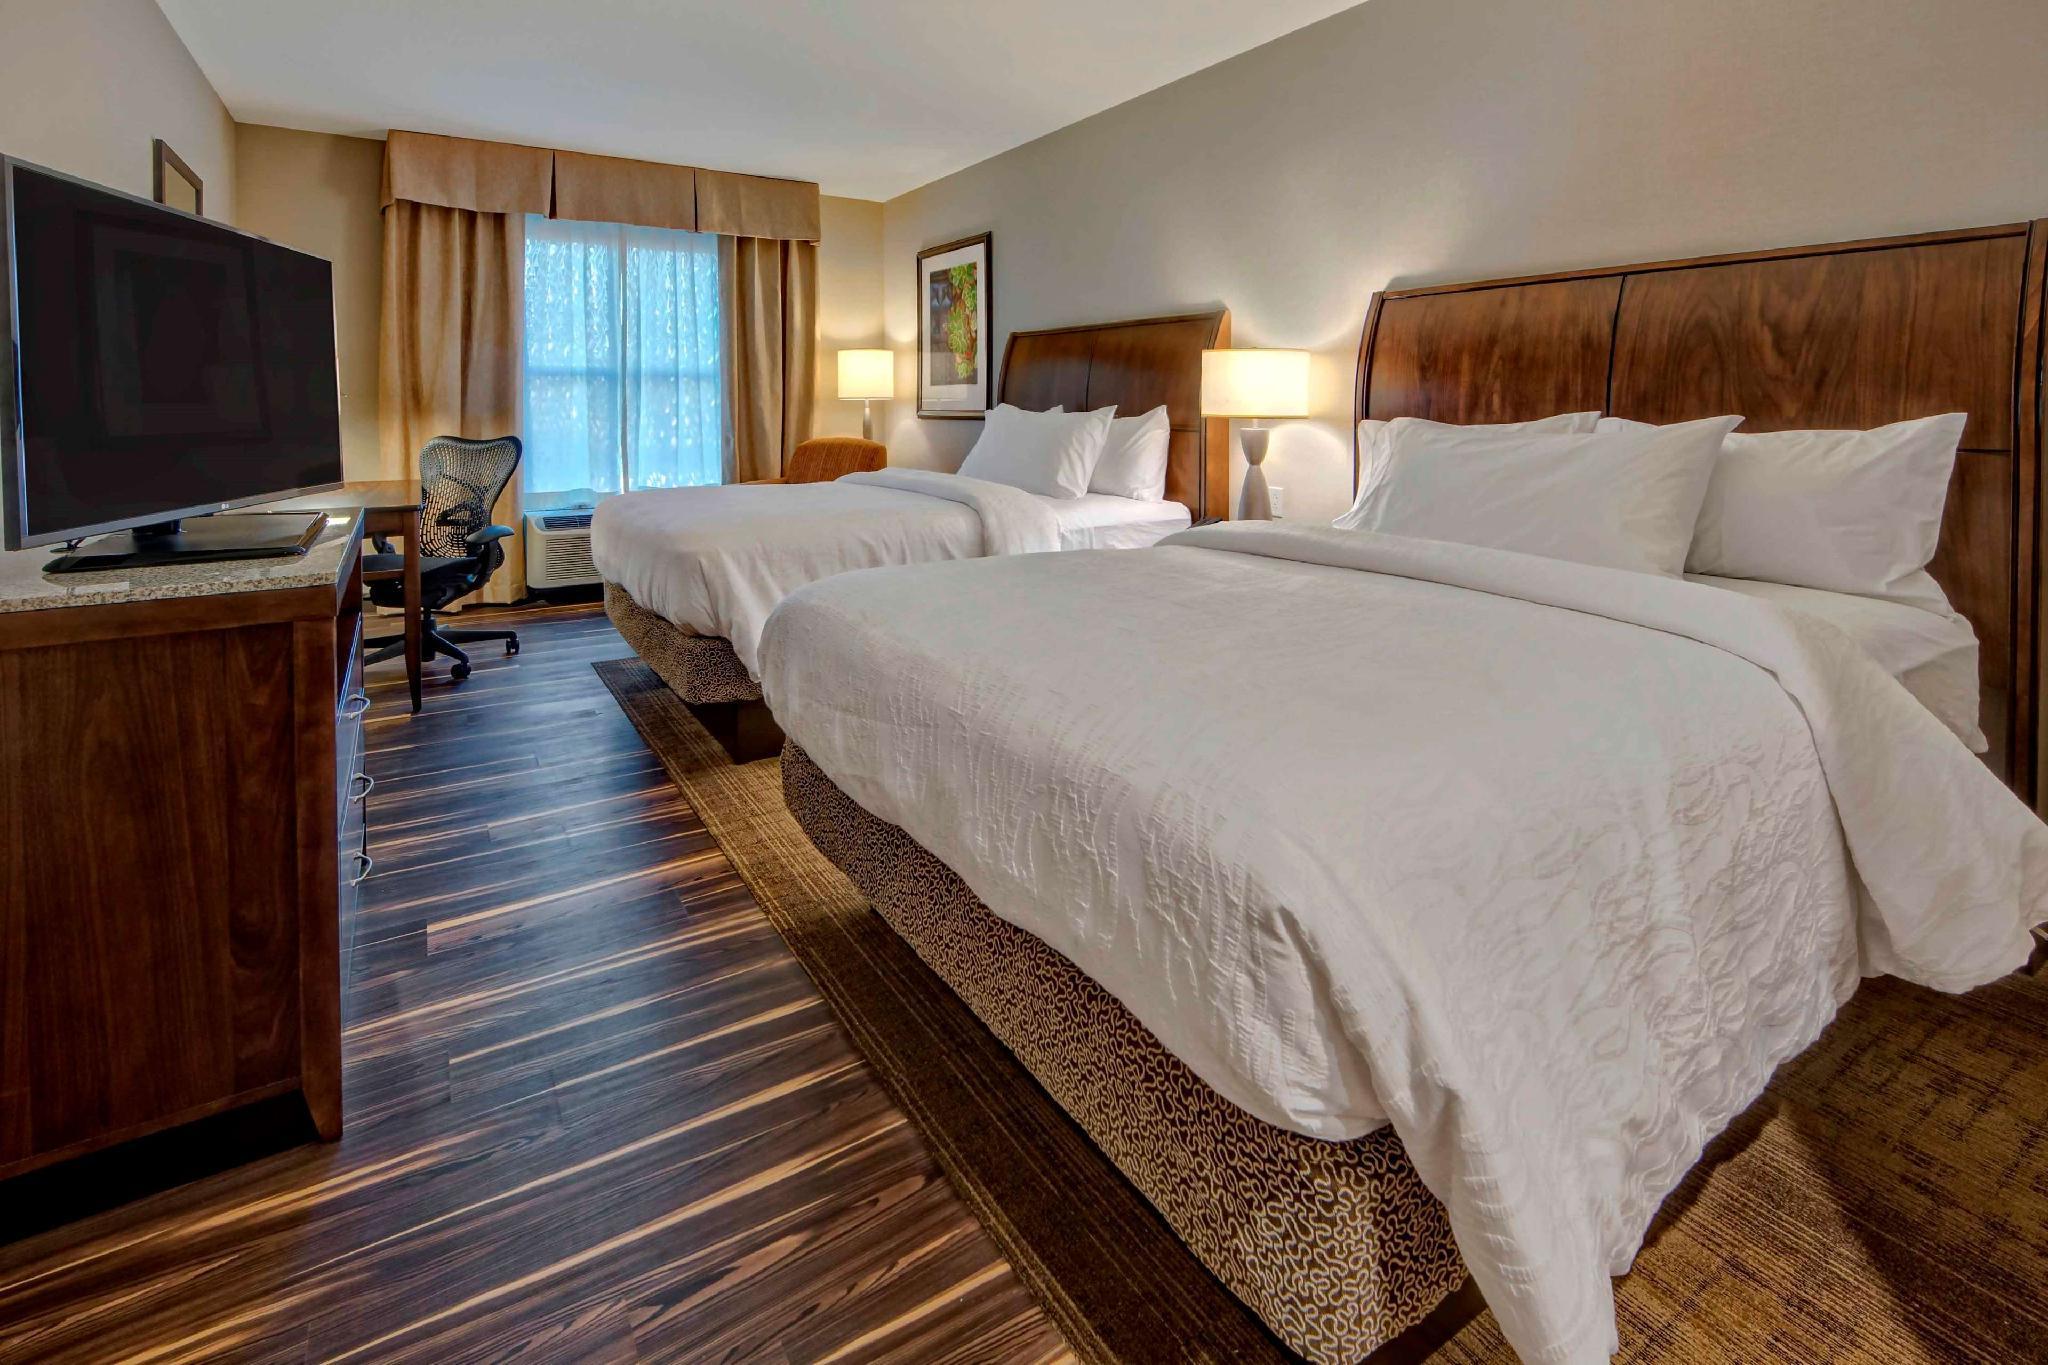 Hilton Garden Inn Nashville Brentwood In Brentwood Tn Room Deals